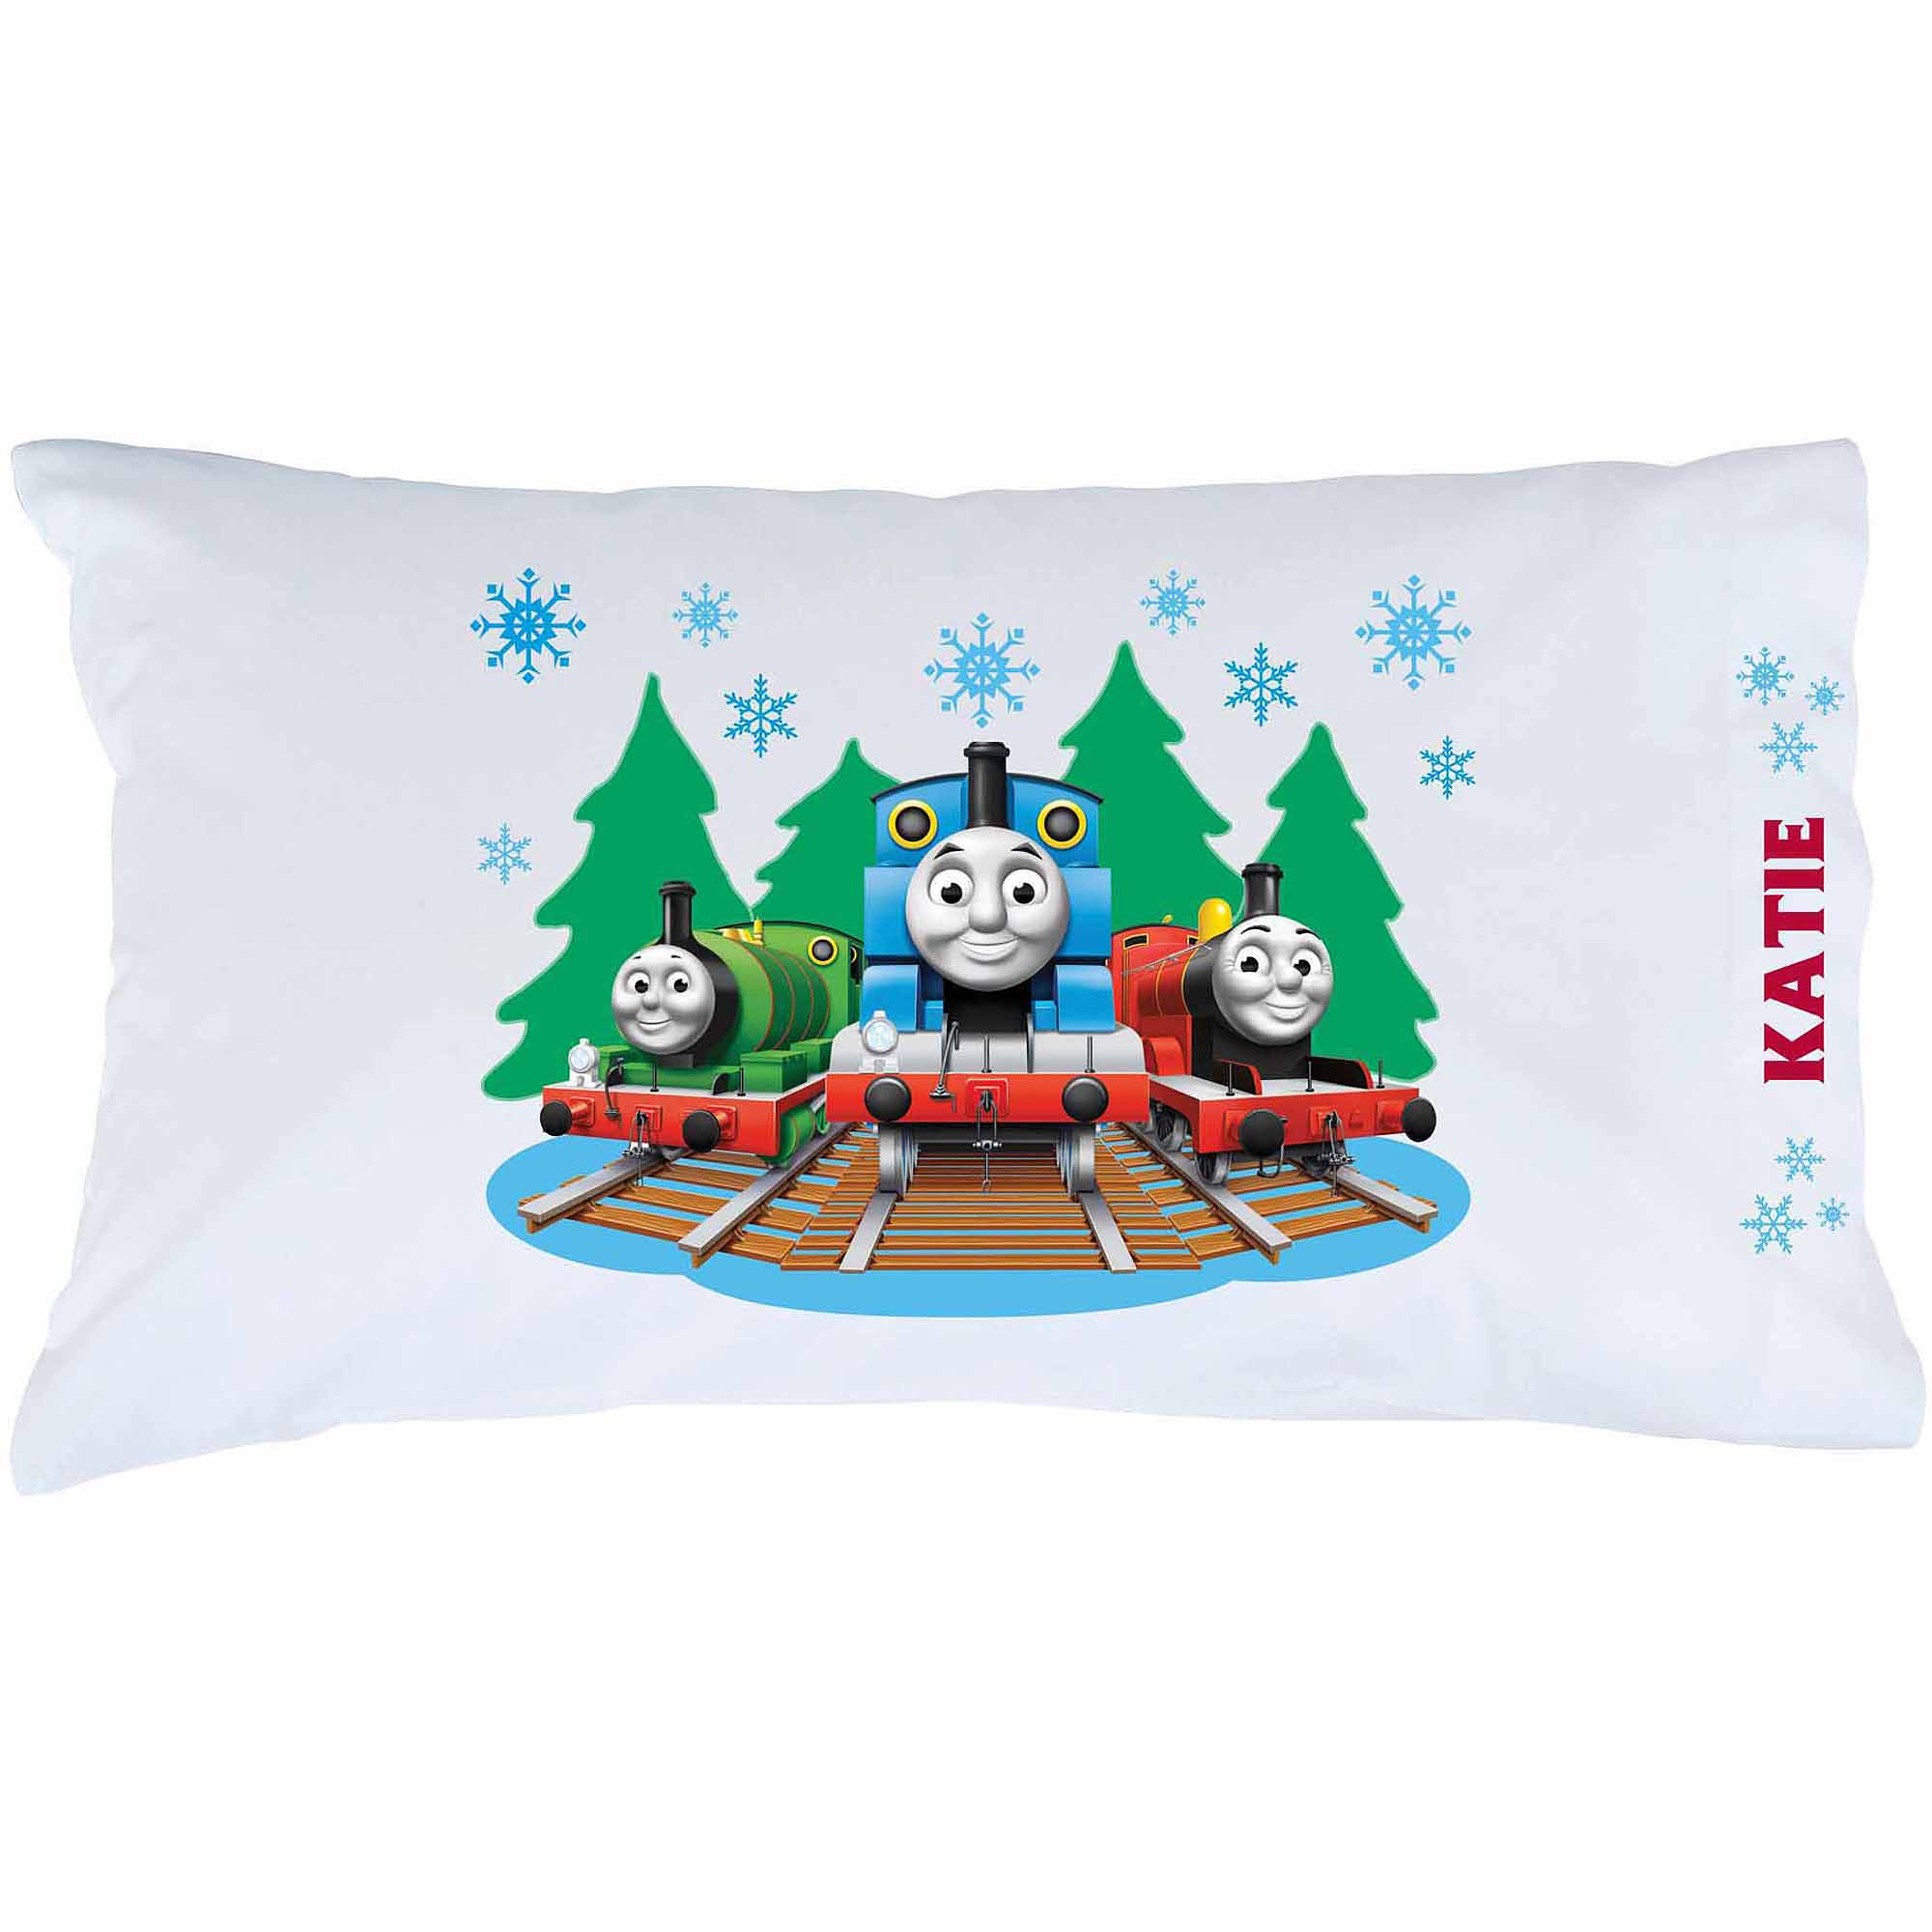 Personalized Thomas & Friends Snowfall Pillowcase